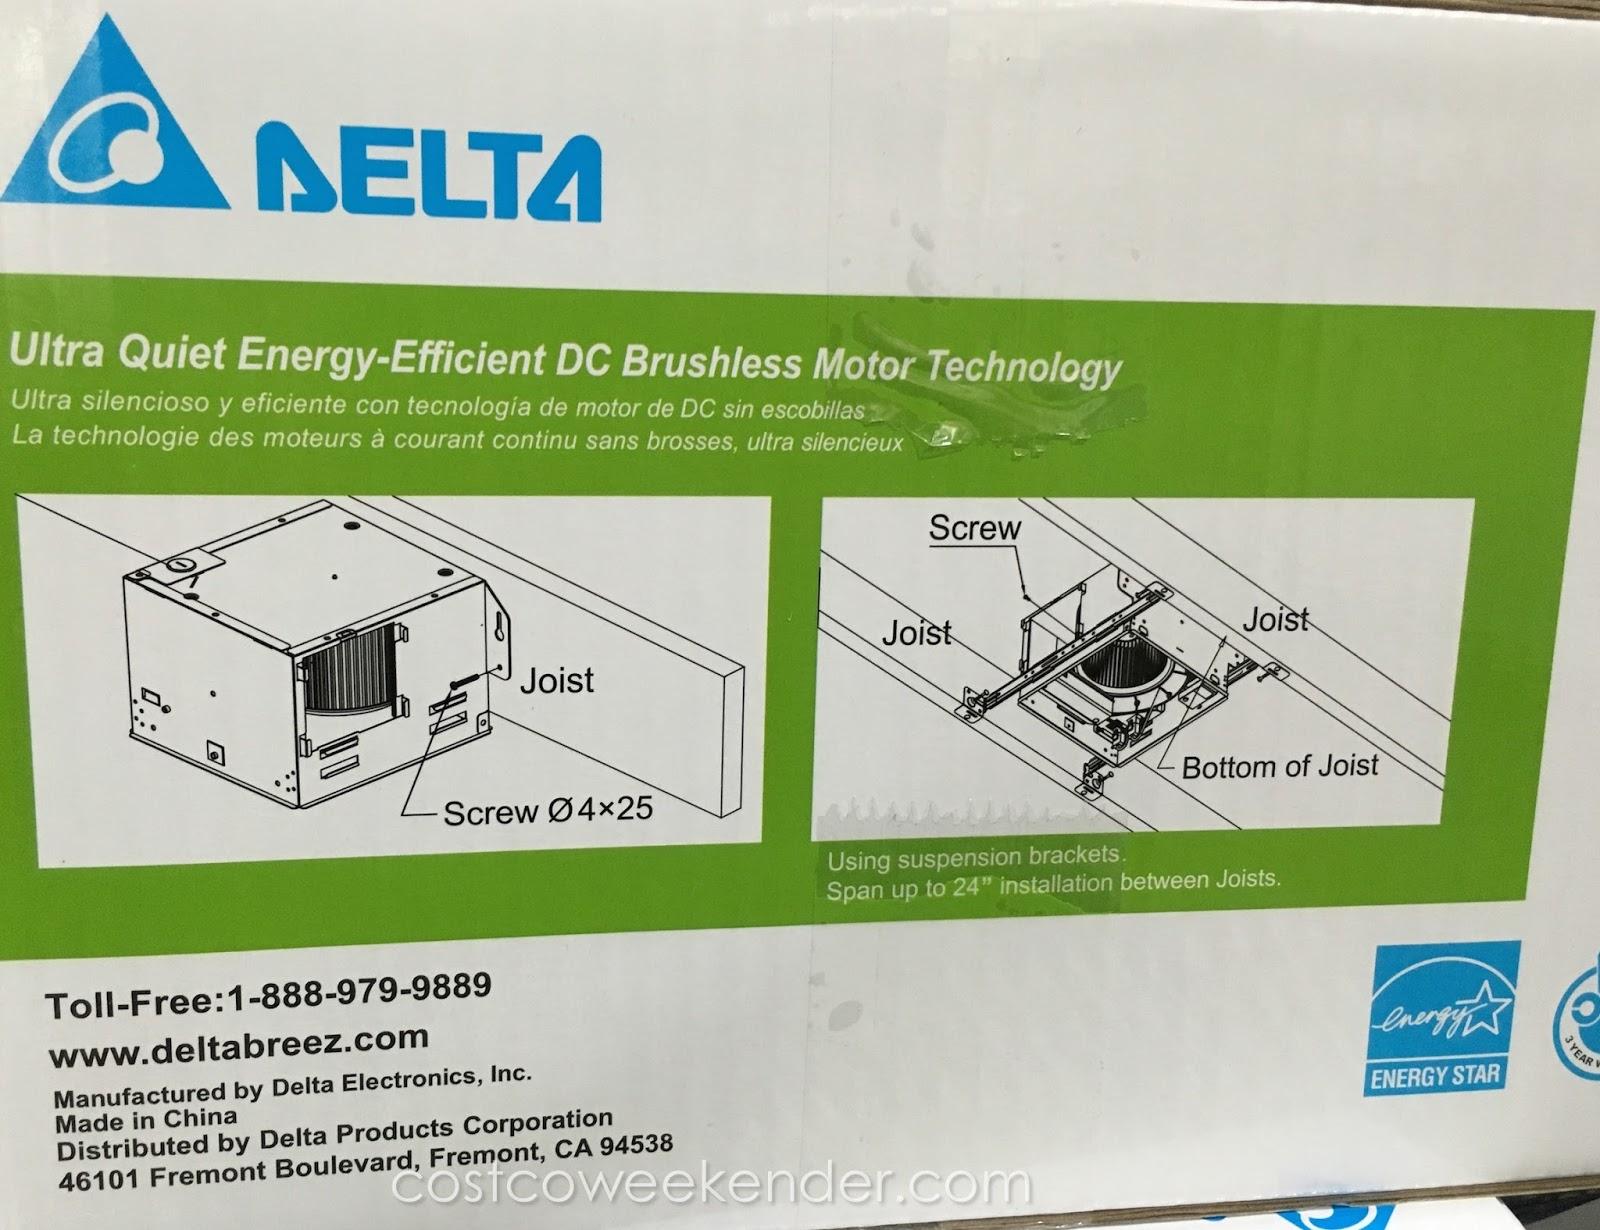 Bathroom Lights Costco delta breez ventilation system bath fan and led light (vfb80hled2